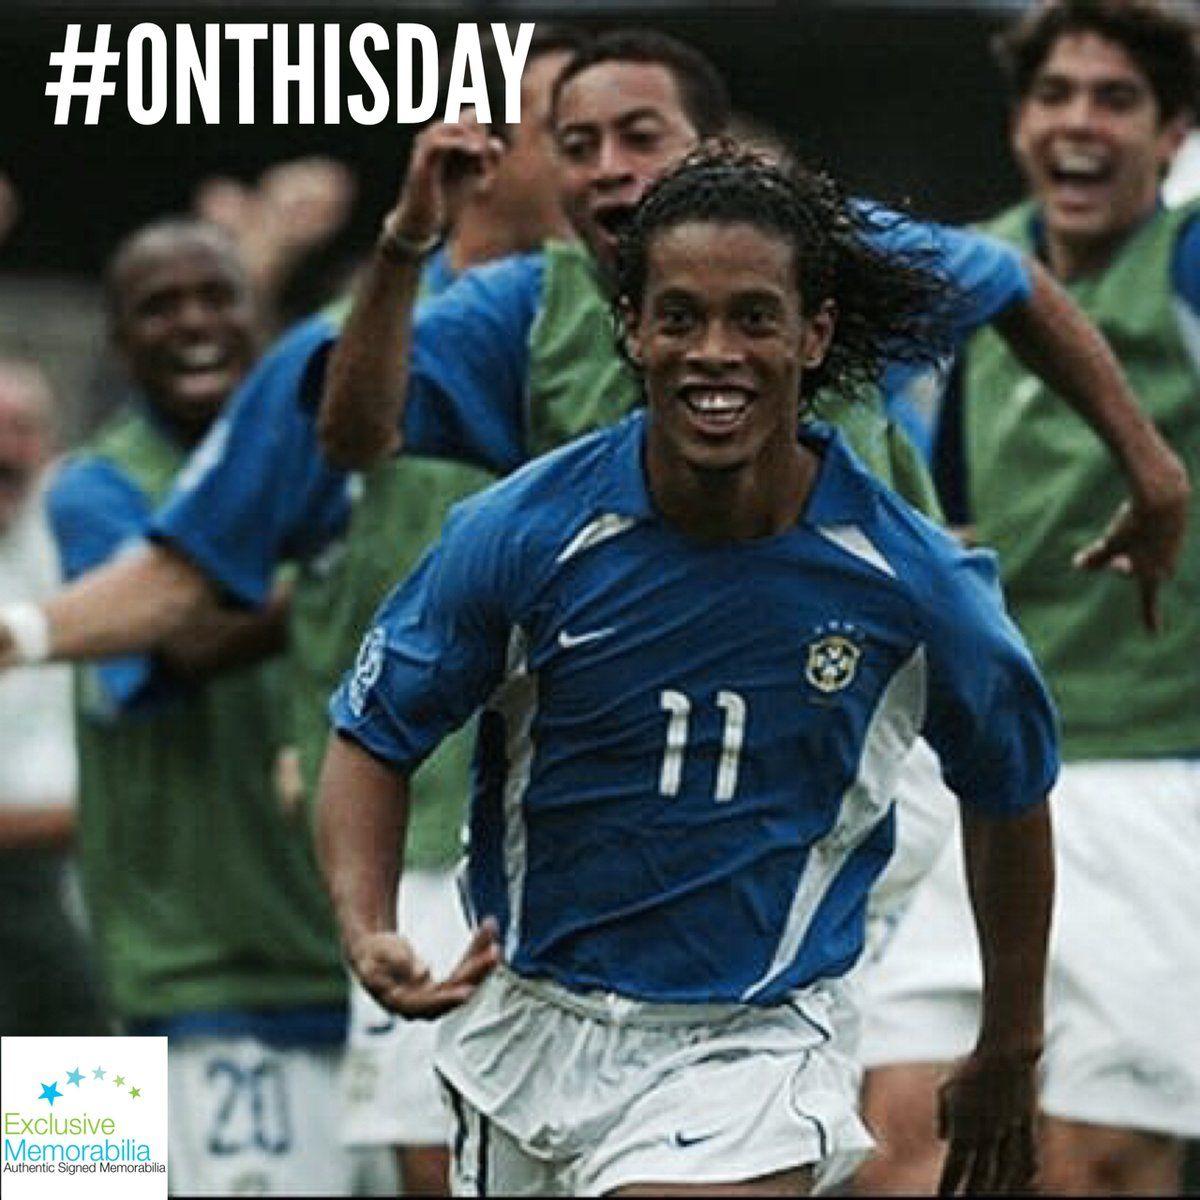 ExclusiveMemorabilia (ExclusiveMem) Ronaldinho jersey